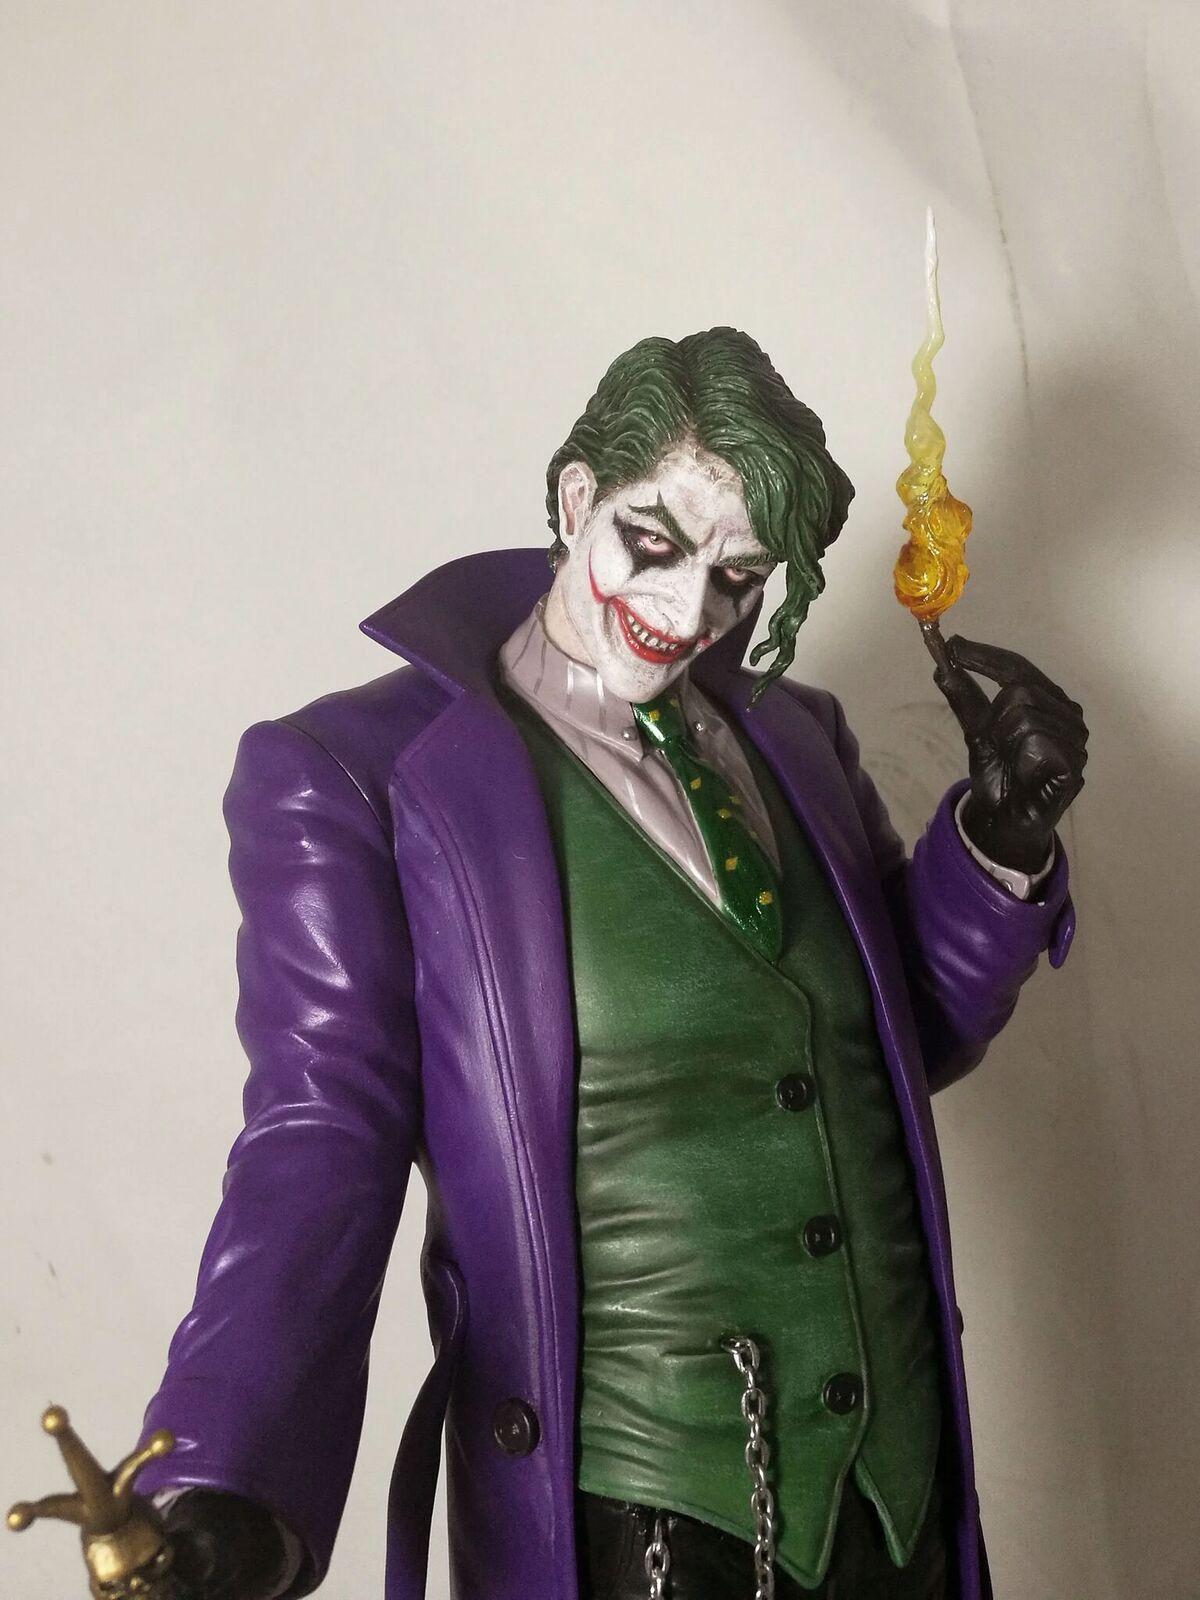 Jokerjul1316-2g Figurine - DC Comics Fantasy Figure Gallery Joker